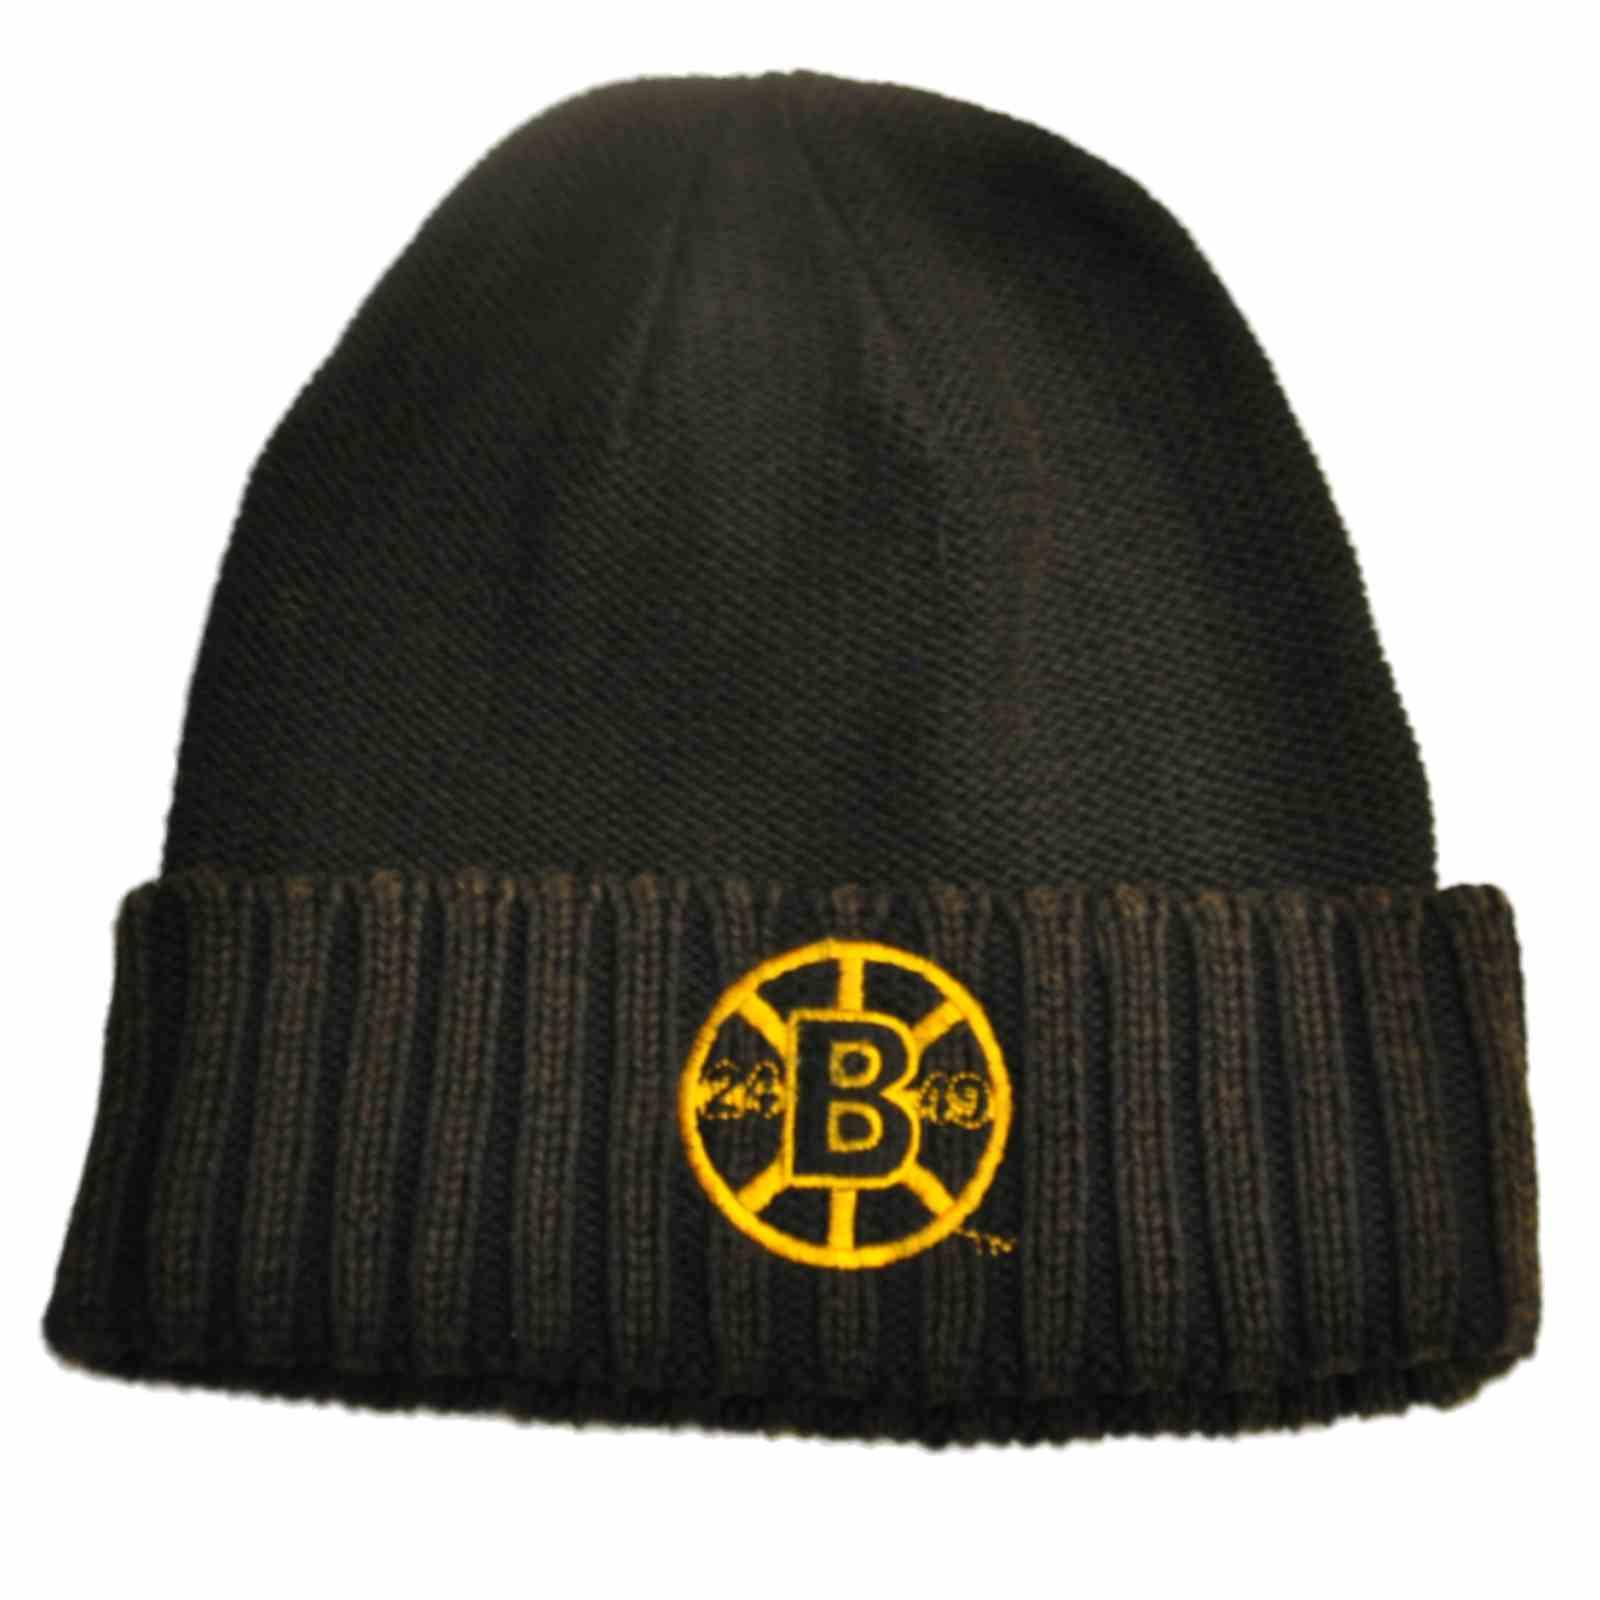 2cd39ca7b93bd Details about Boston Bruins Retro Brand Unisex Faded Black Cuffed Knit  Beanie Hat Cap